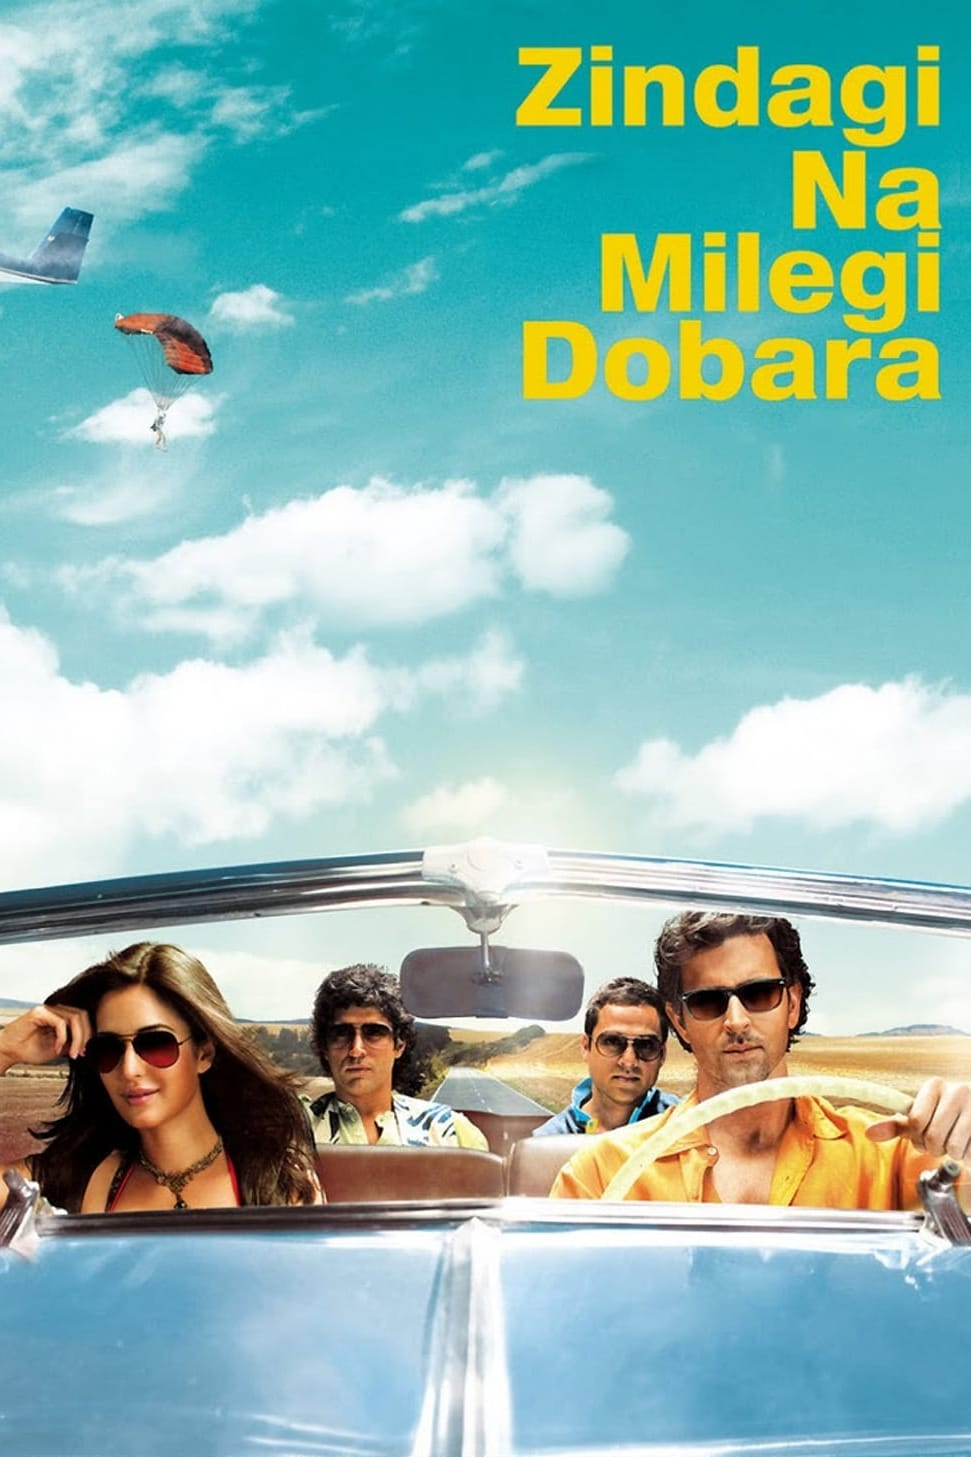 Zindagi Na Milegi Dobara Movie Streaming Online Watch on Amazon, Netflix